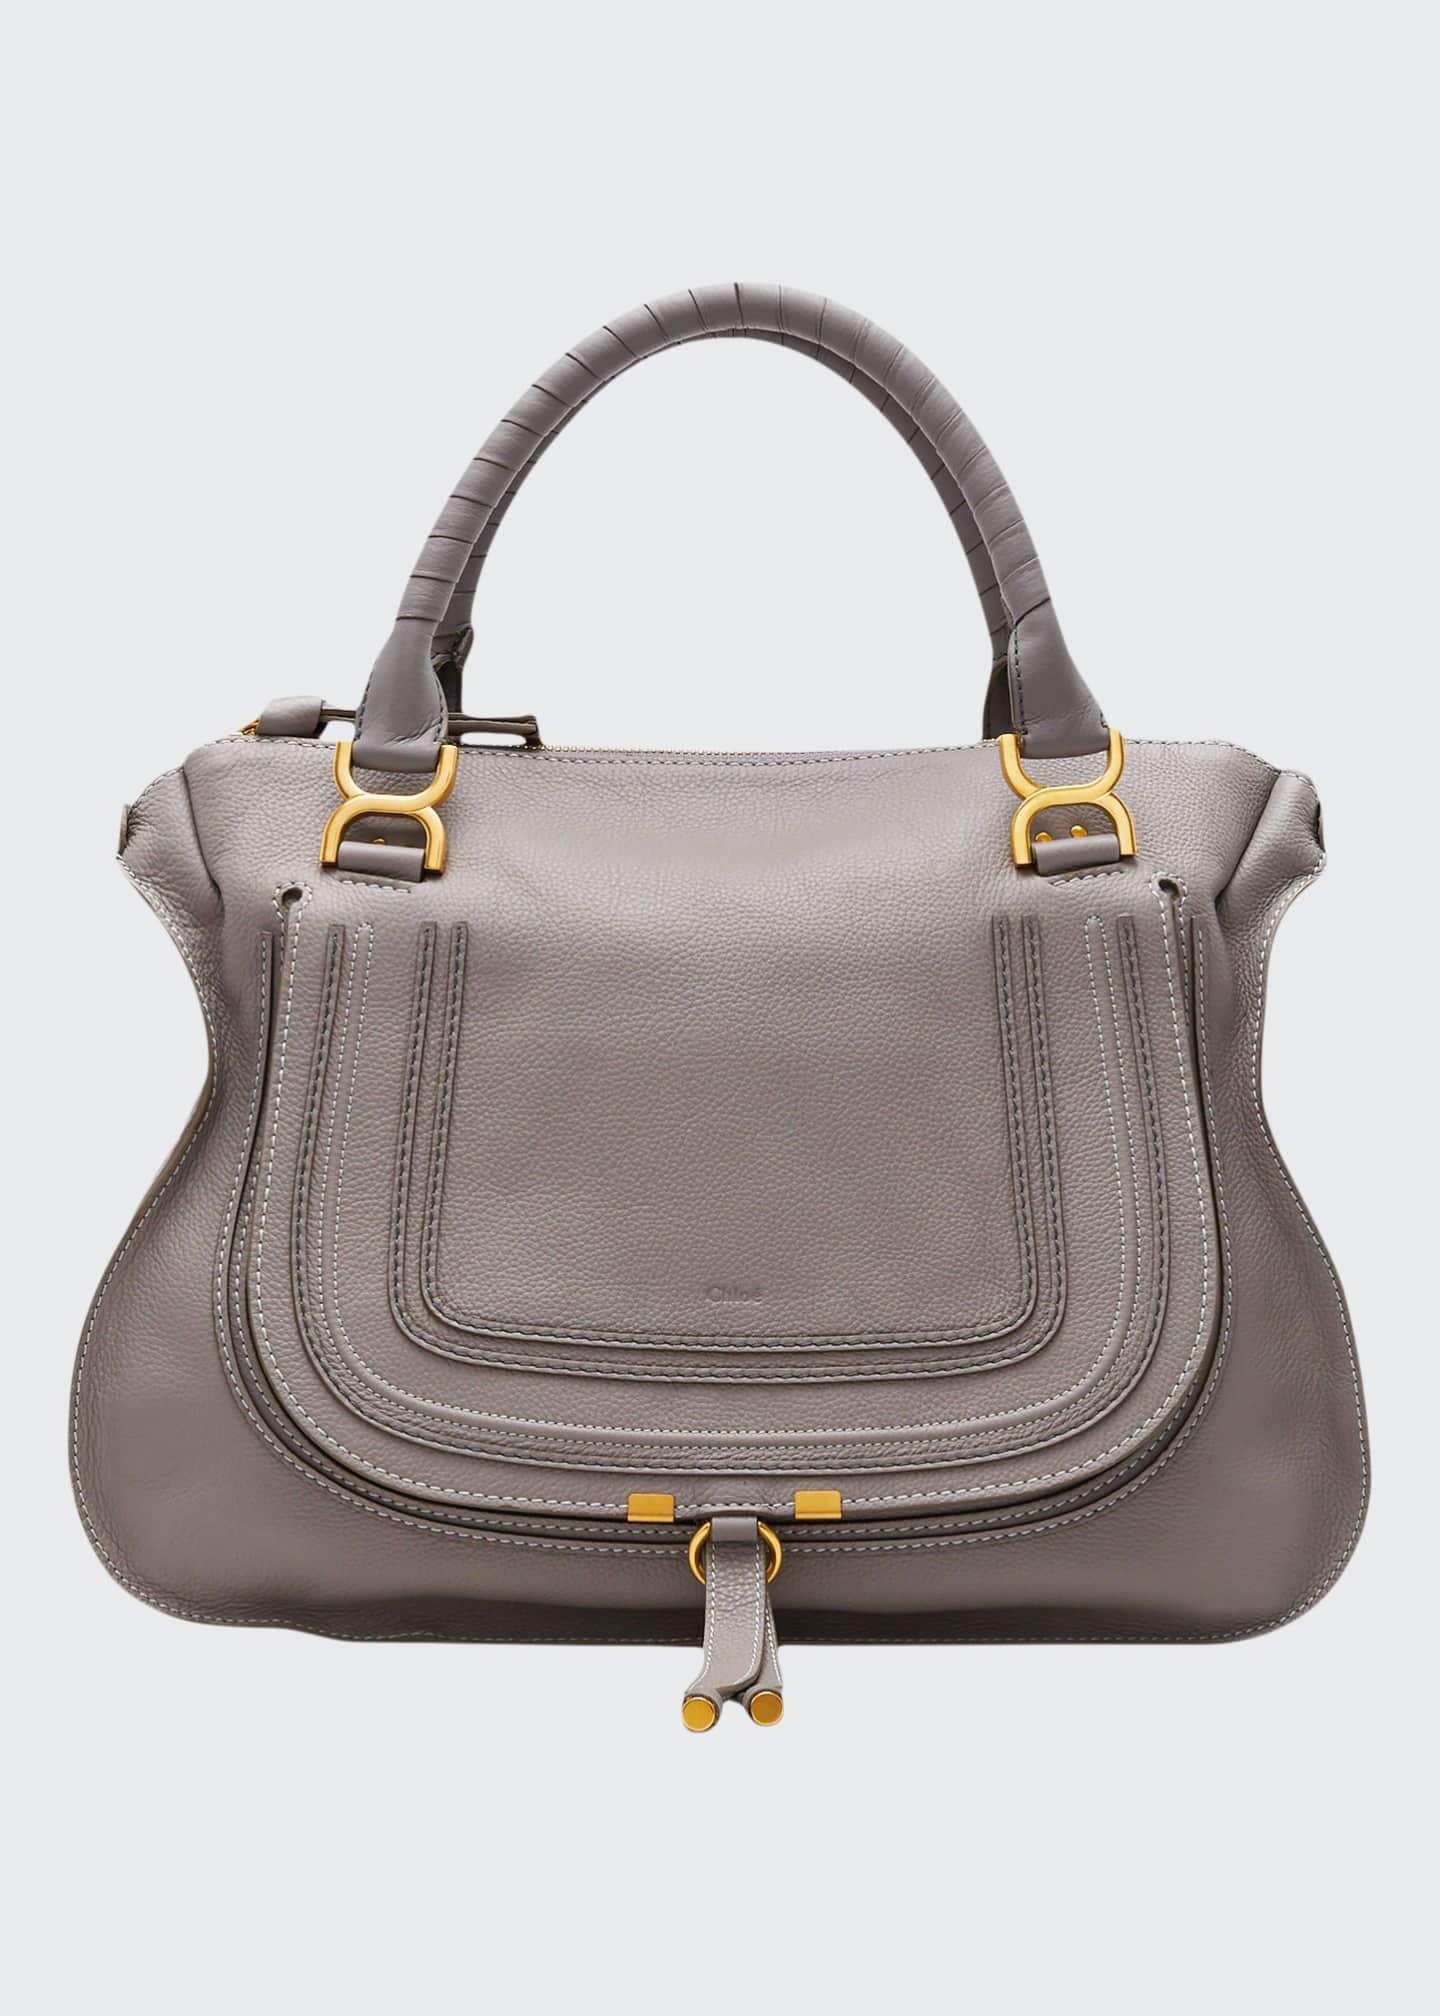 Chloe Marcie Large Leather Satchel Bag